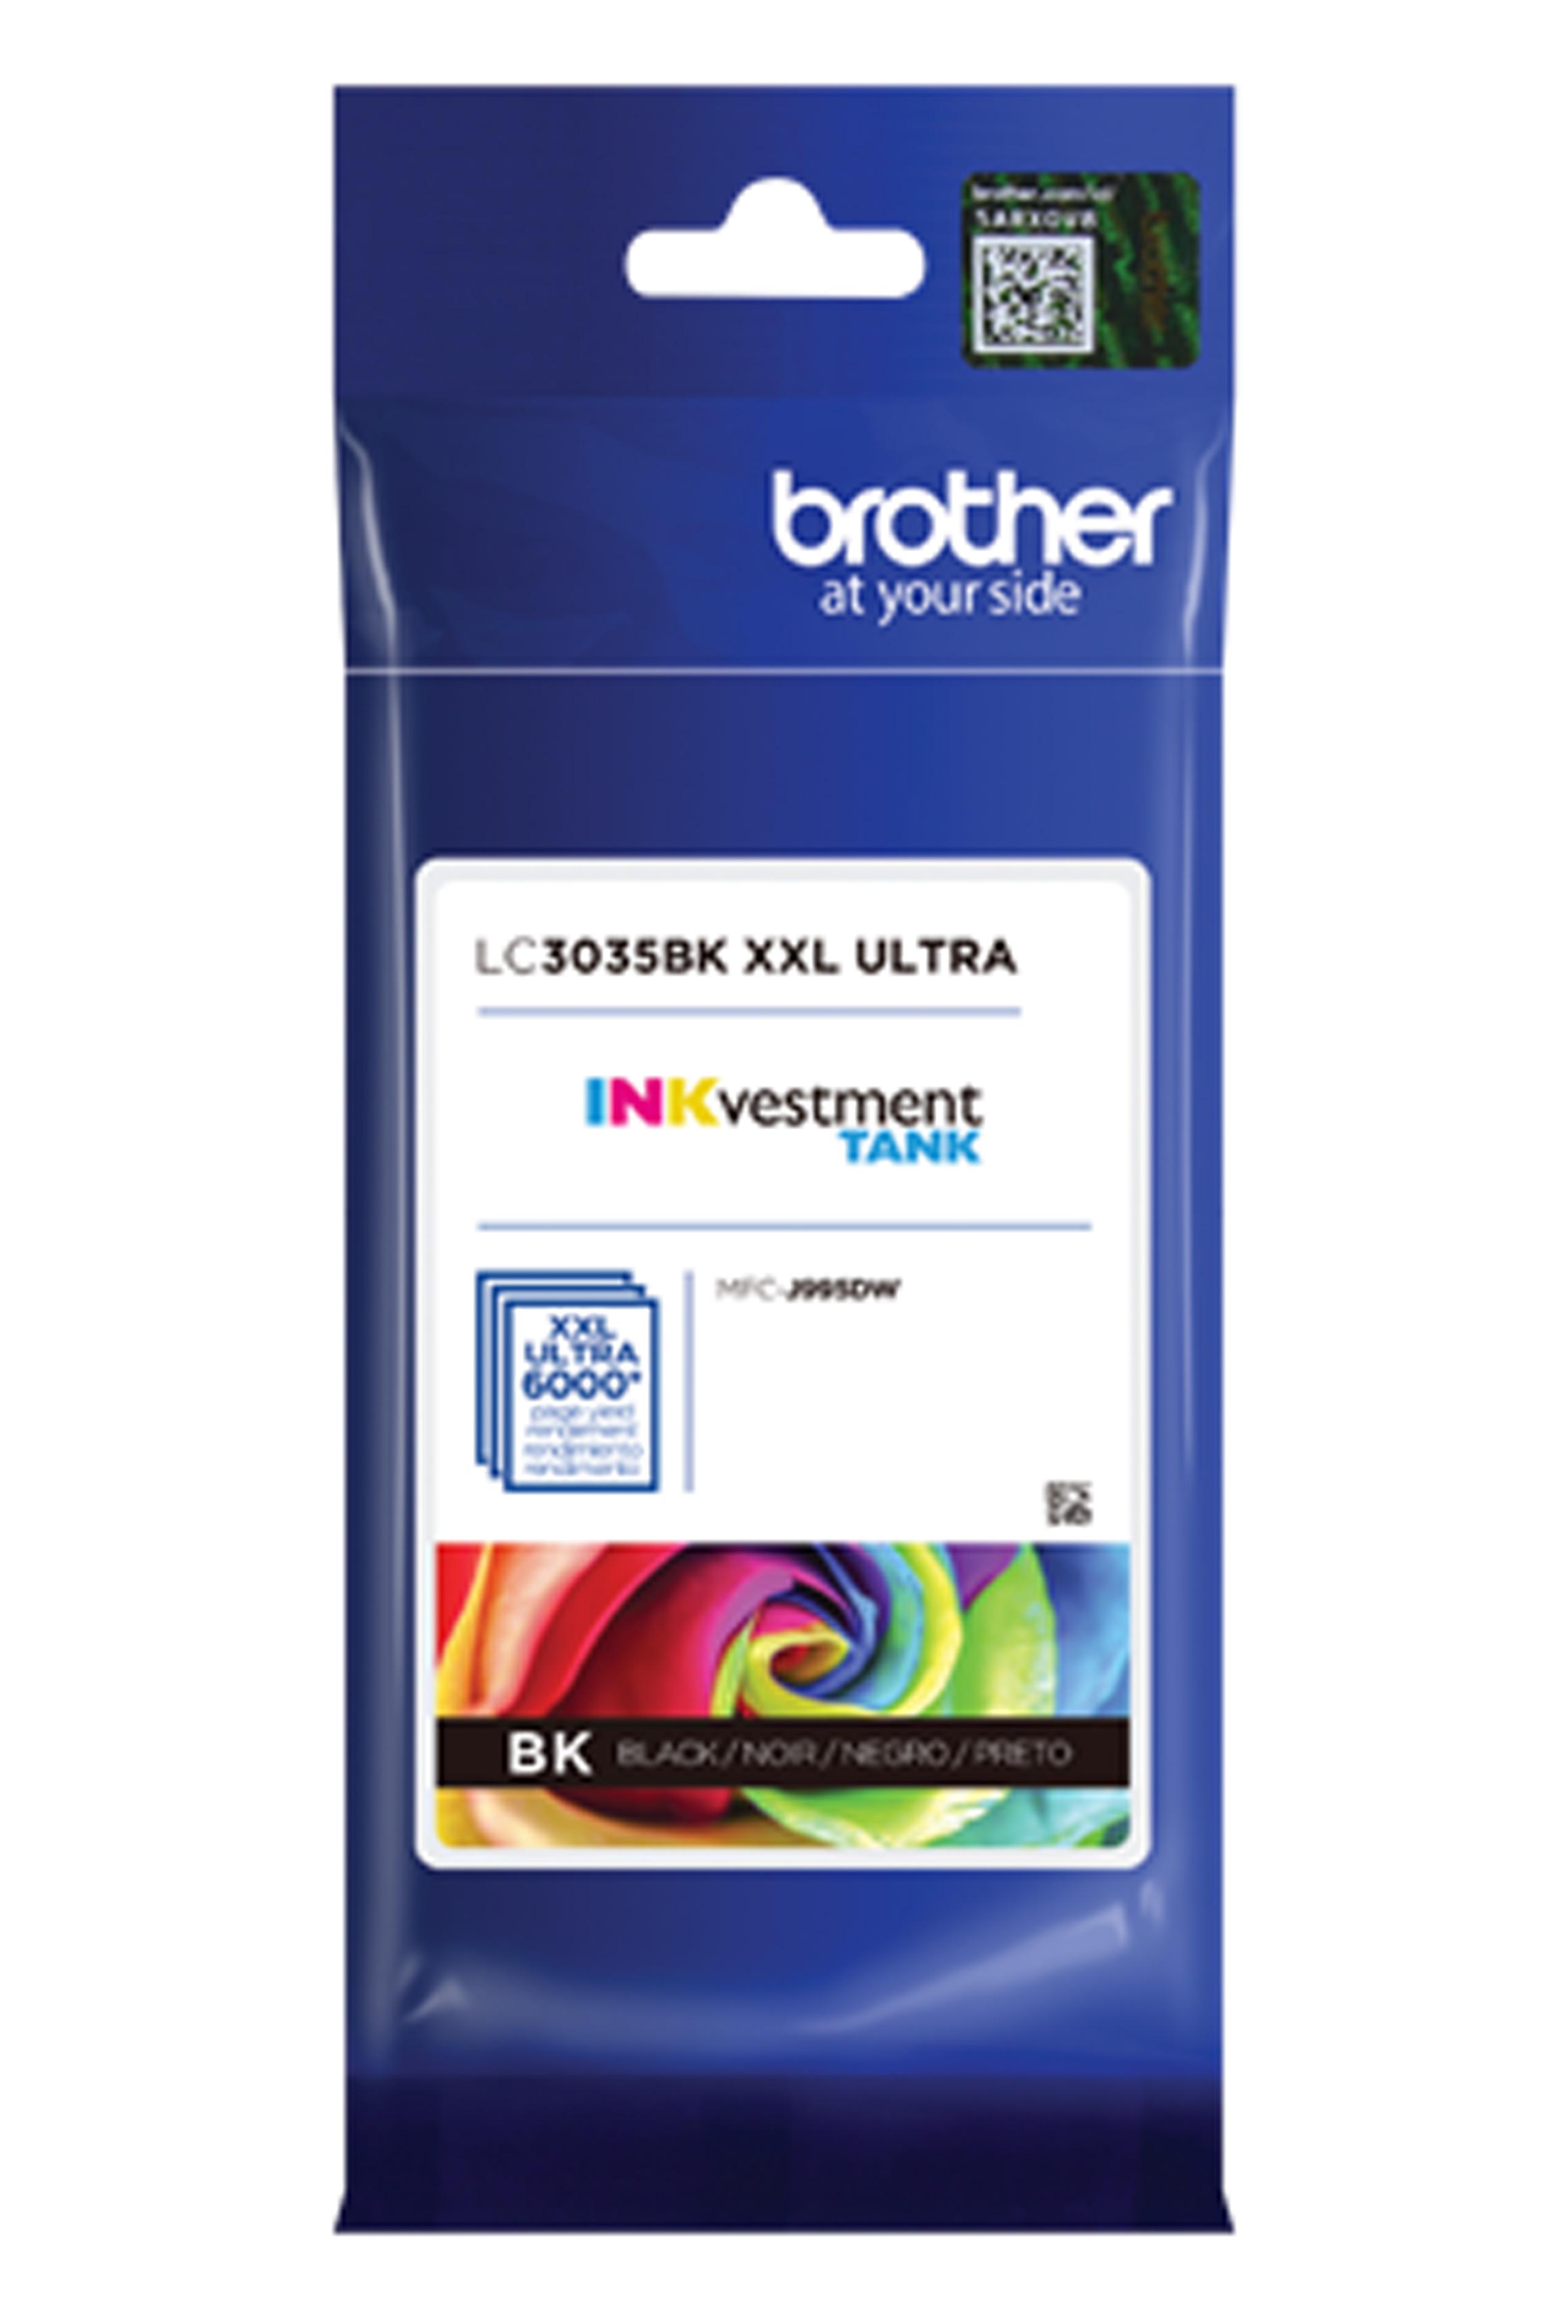 Brother Ultra High Yield Black Ink Cartridge ( LC3035BK)